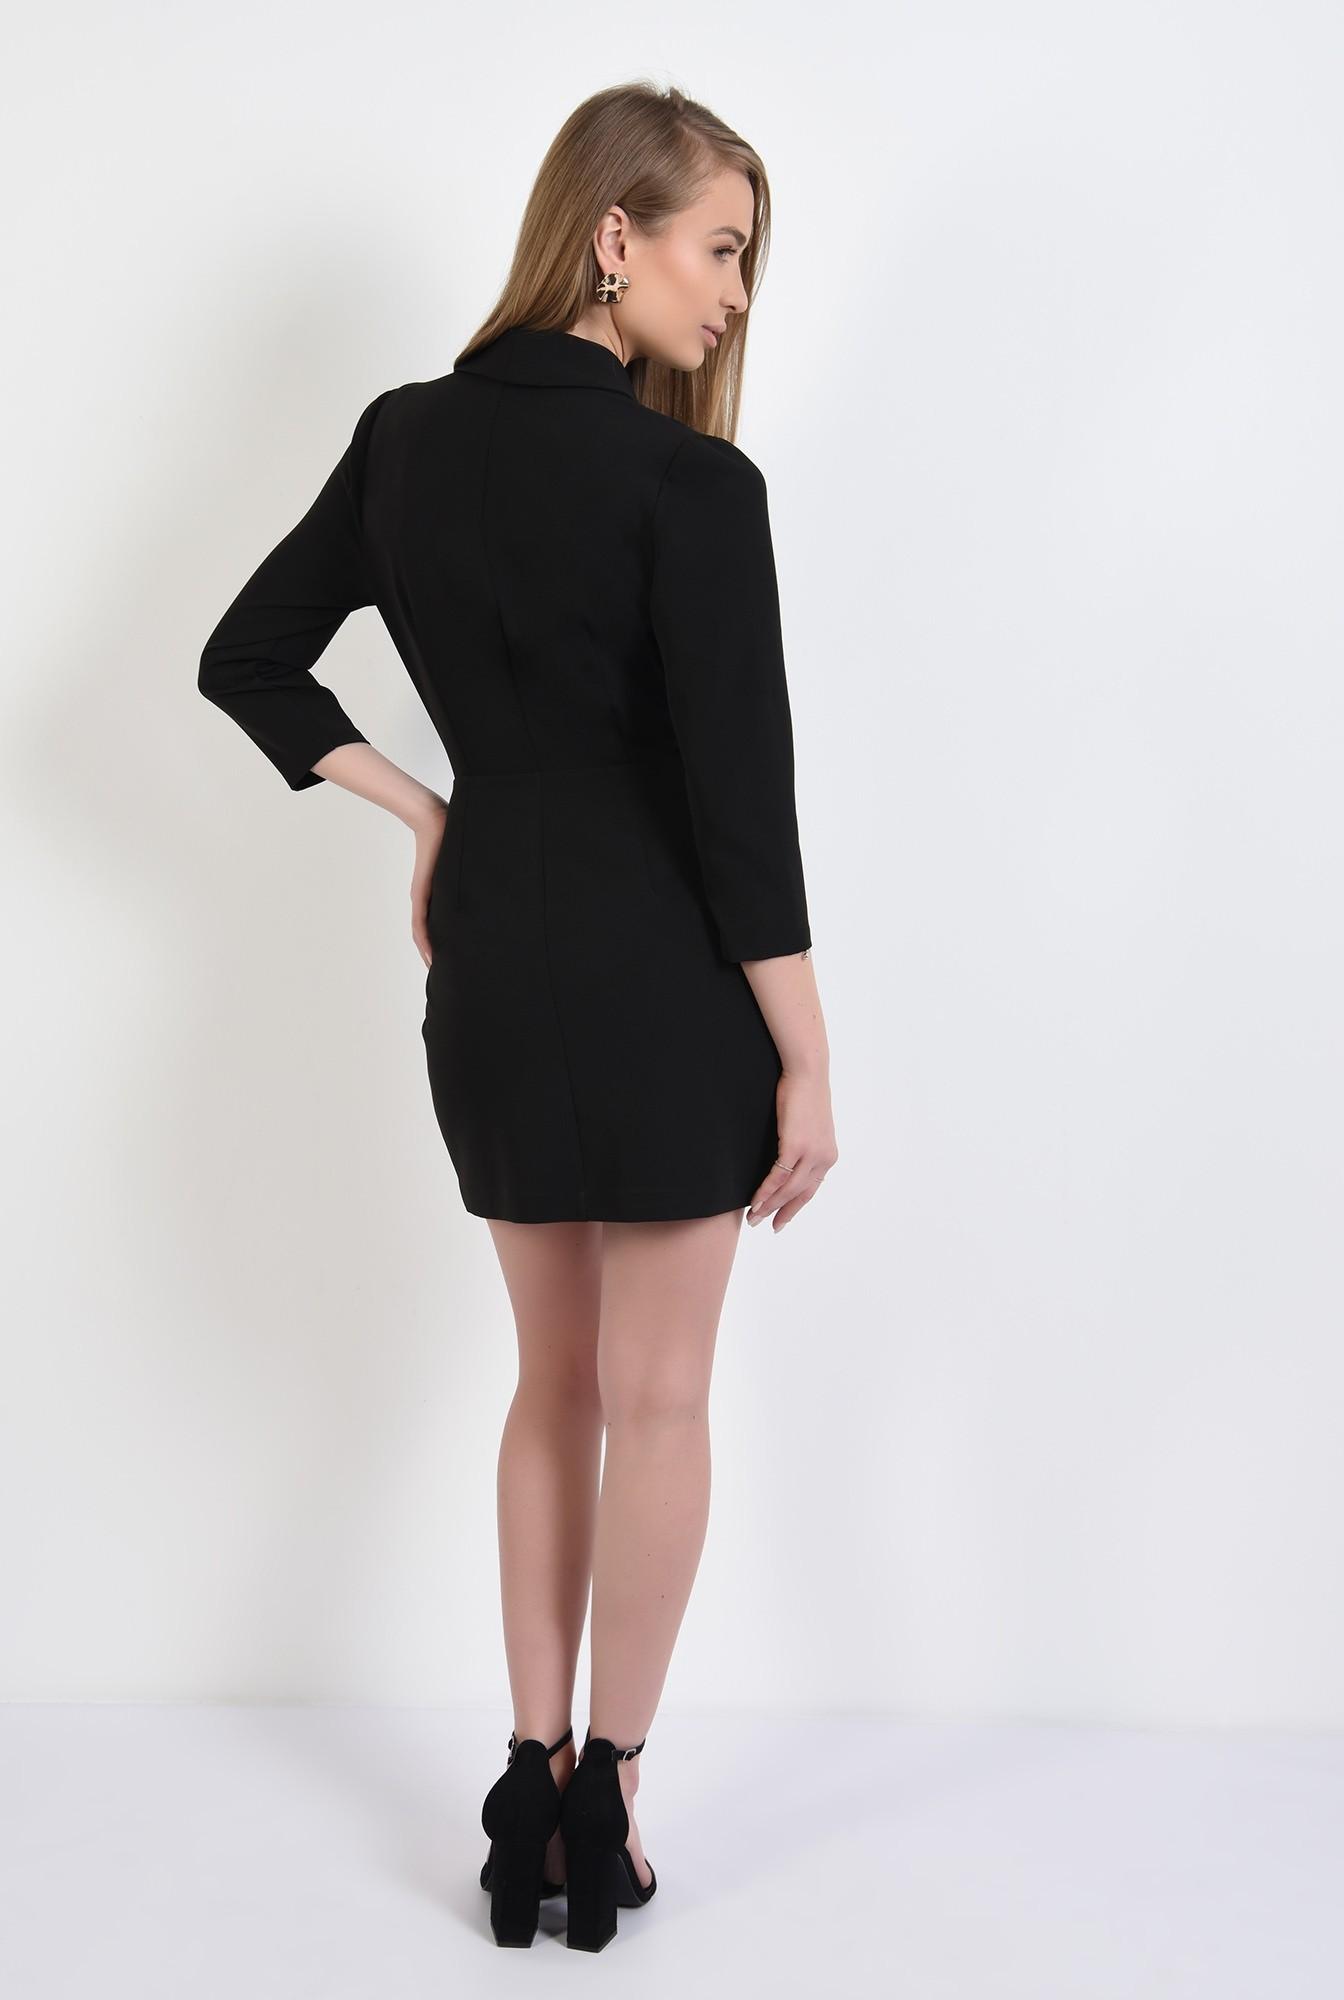 1 - rochie blazer, neagra, scurta, doua randuri de nasturi, revere